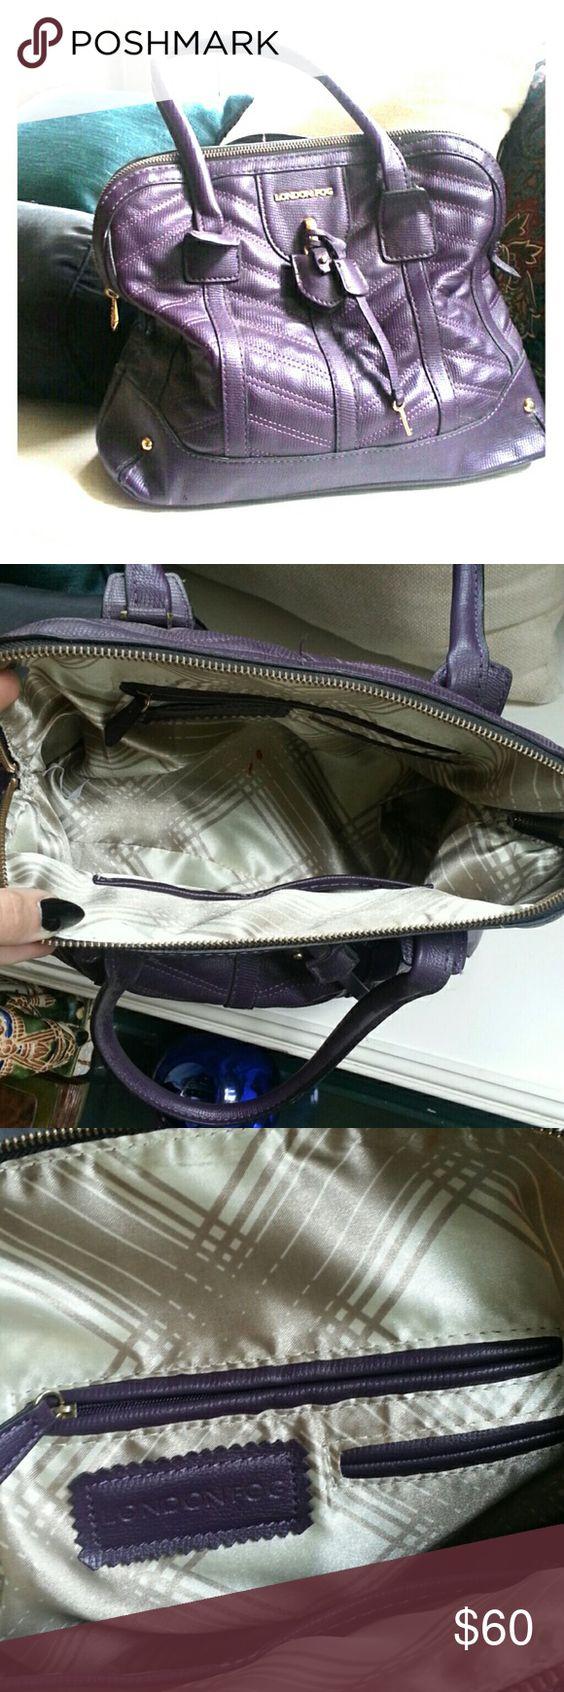 London Fog Purse Eggplant purple leather, large purse, with gold hardware London Fog Bags Totes